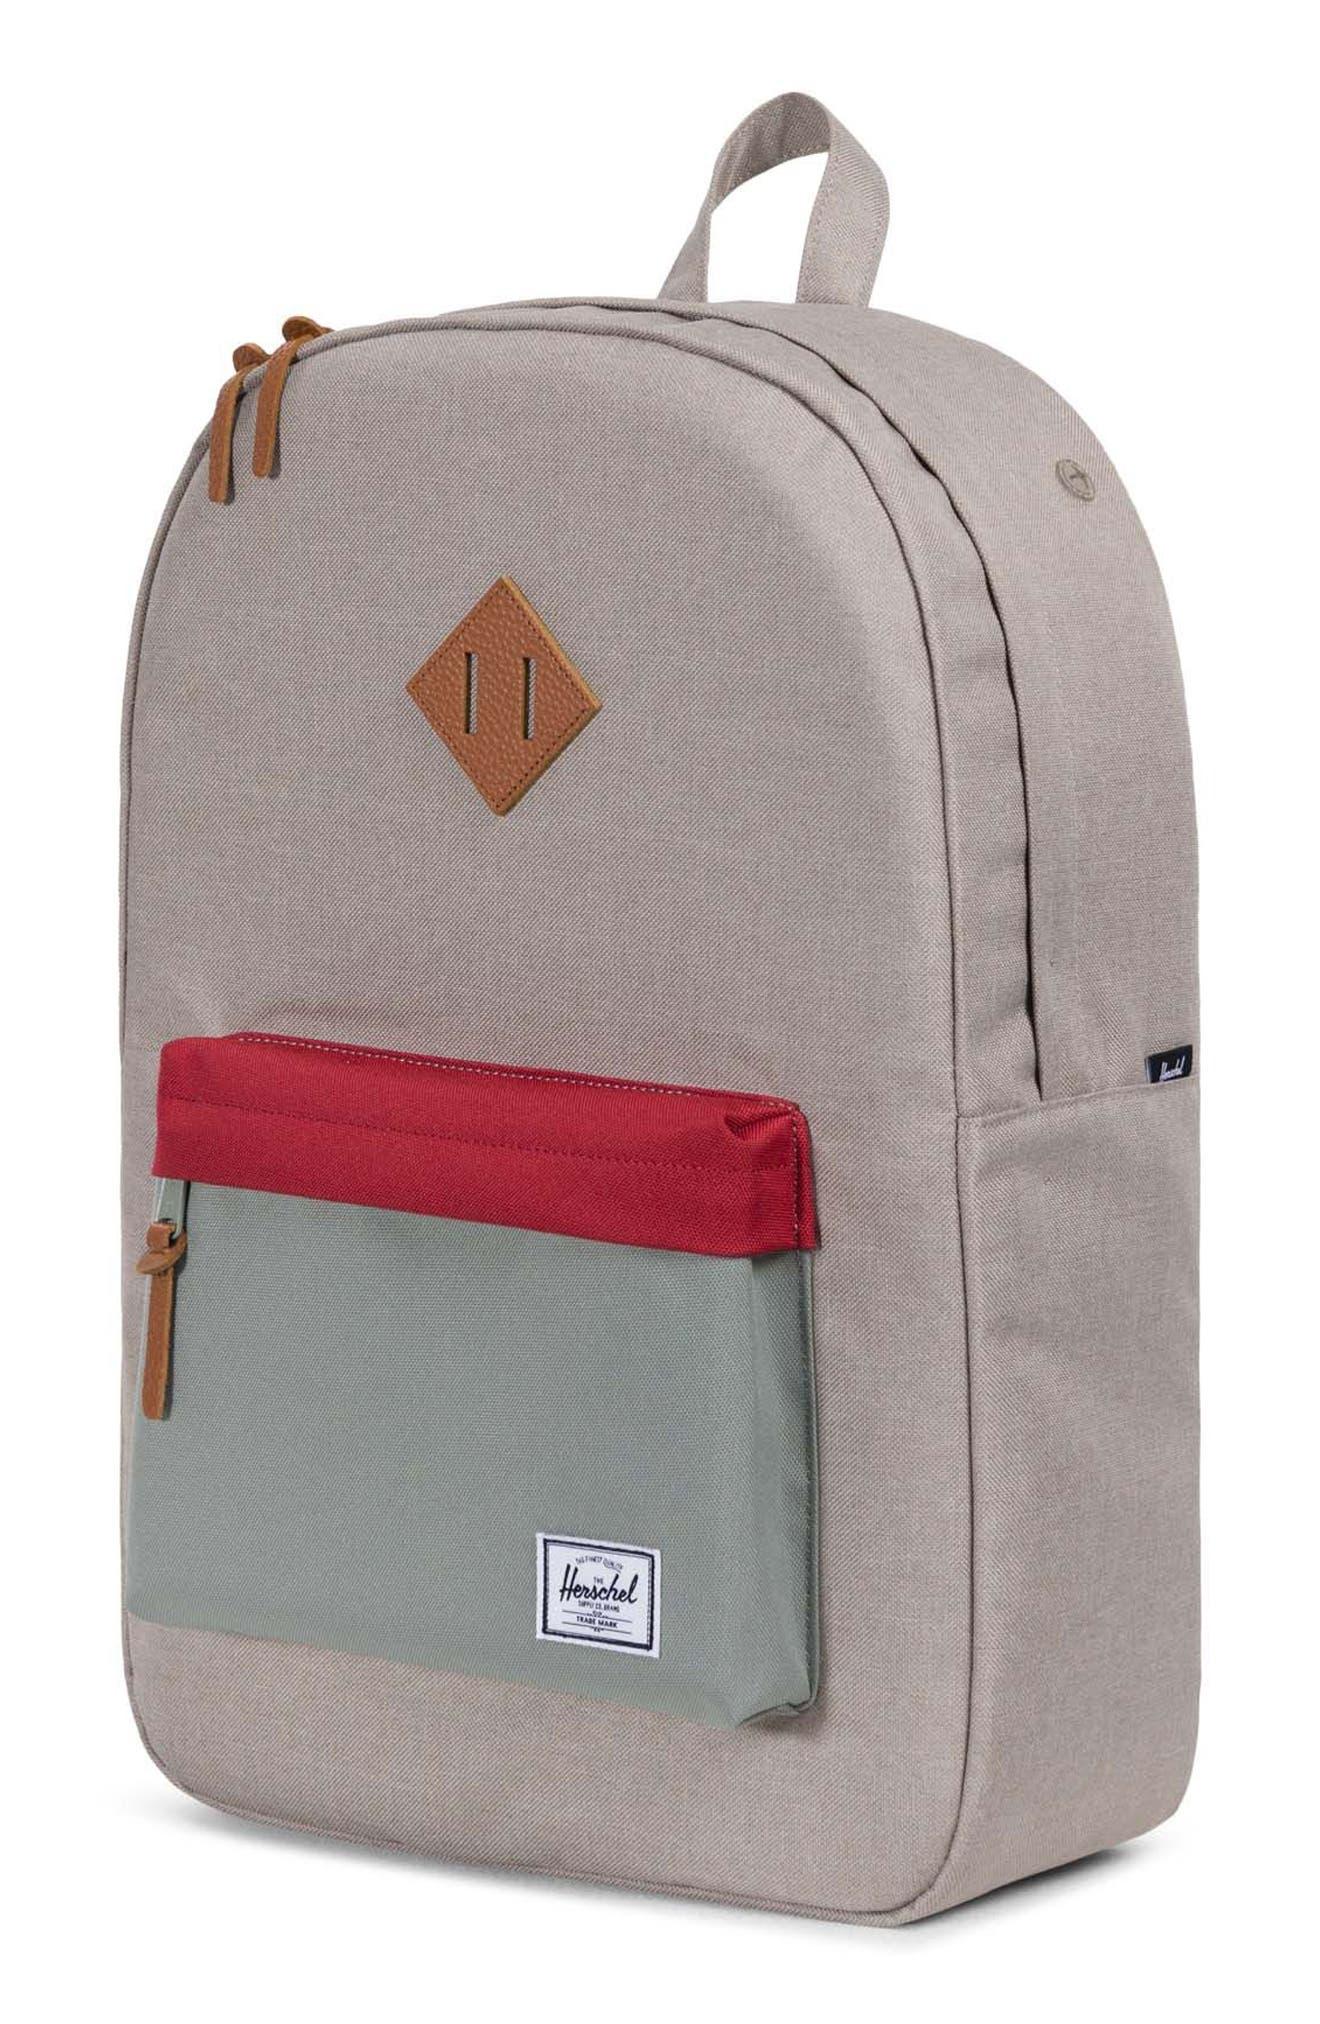 Heritage Backpack,                             Alternate thumbnail 4, color,                             Khaki/ Shadow/ Brick Red/ Tan